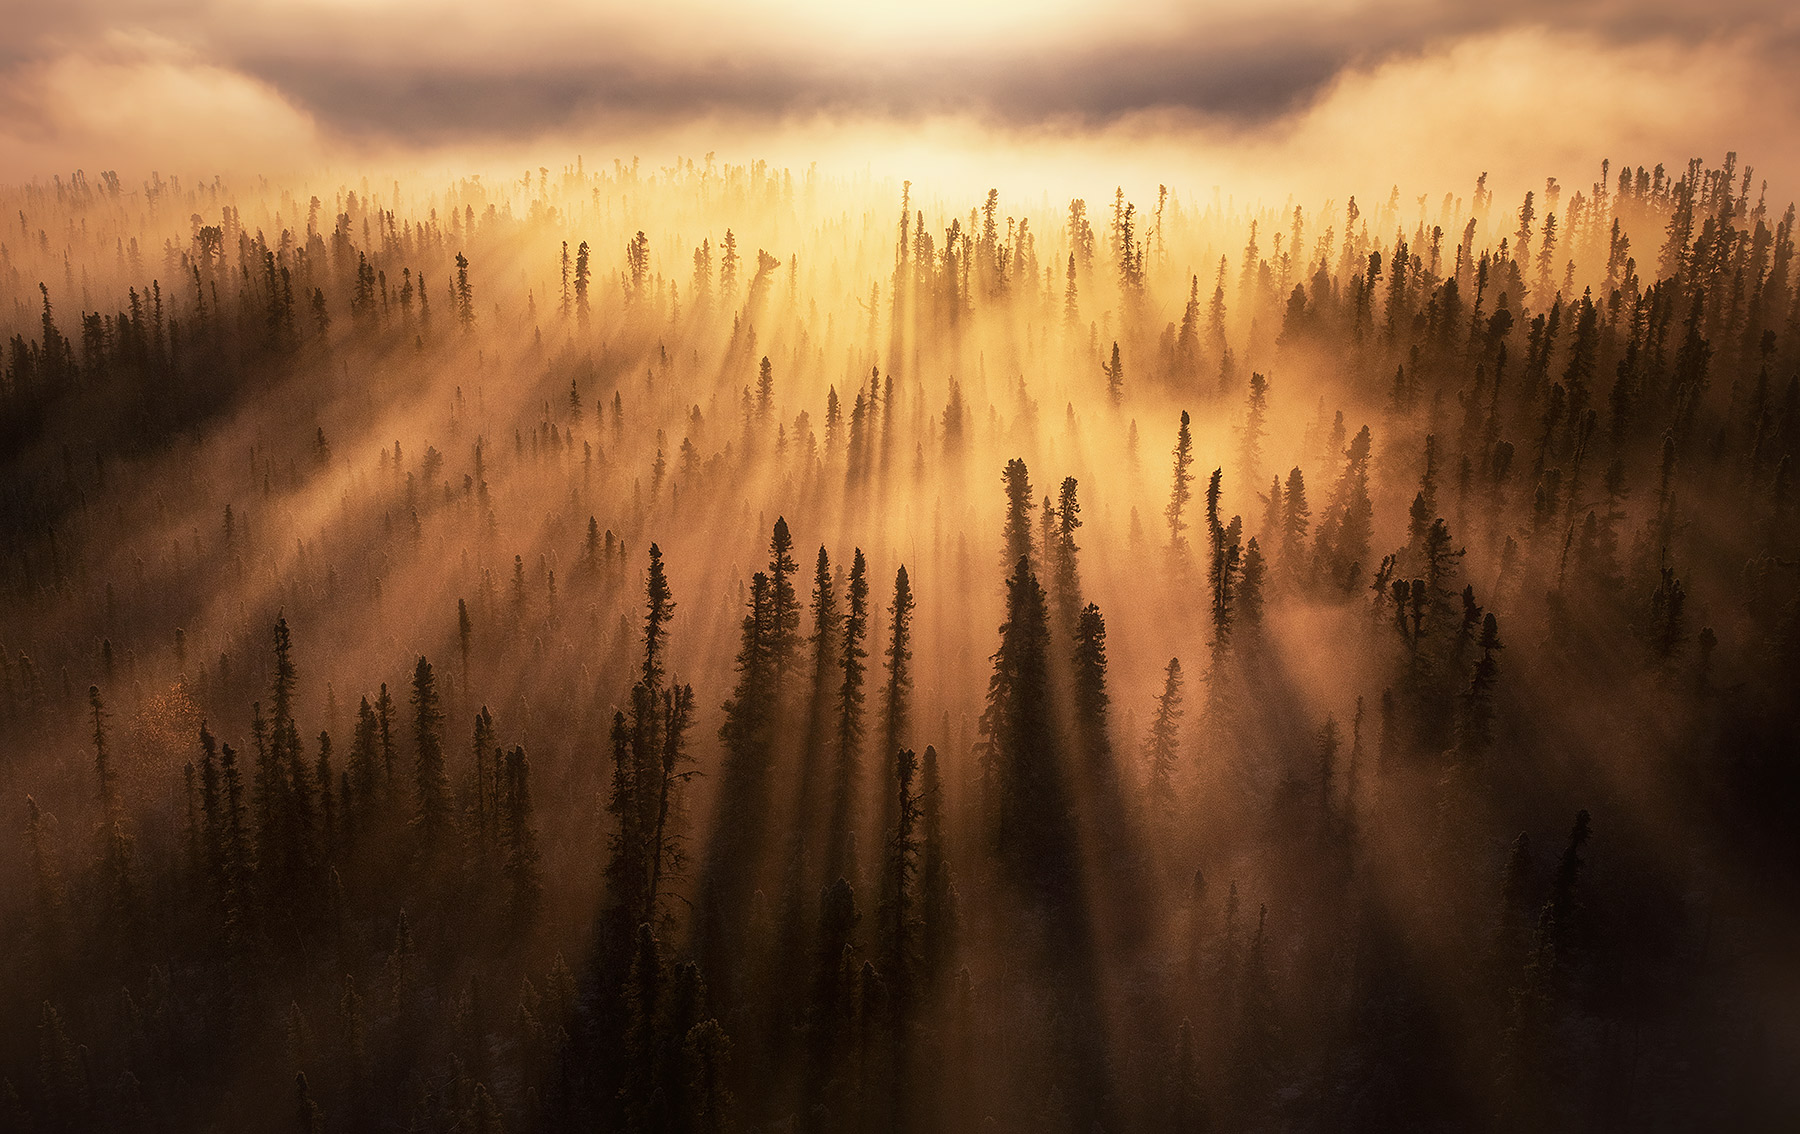 Yukon, forest, beams, light beam, godbeam, photo